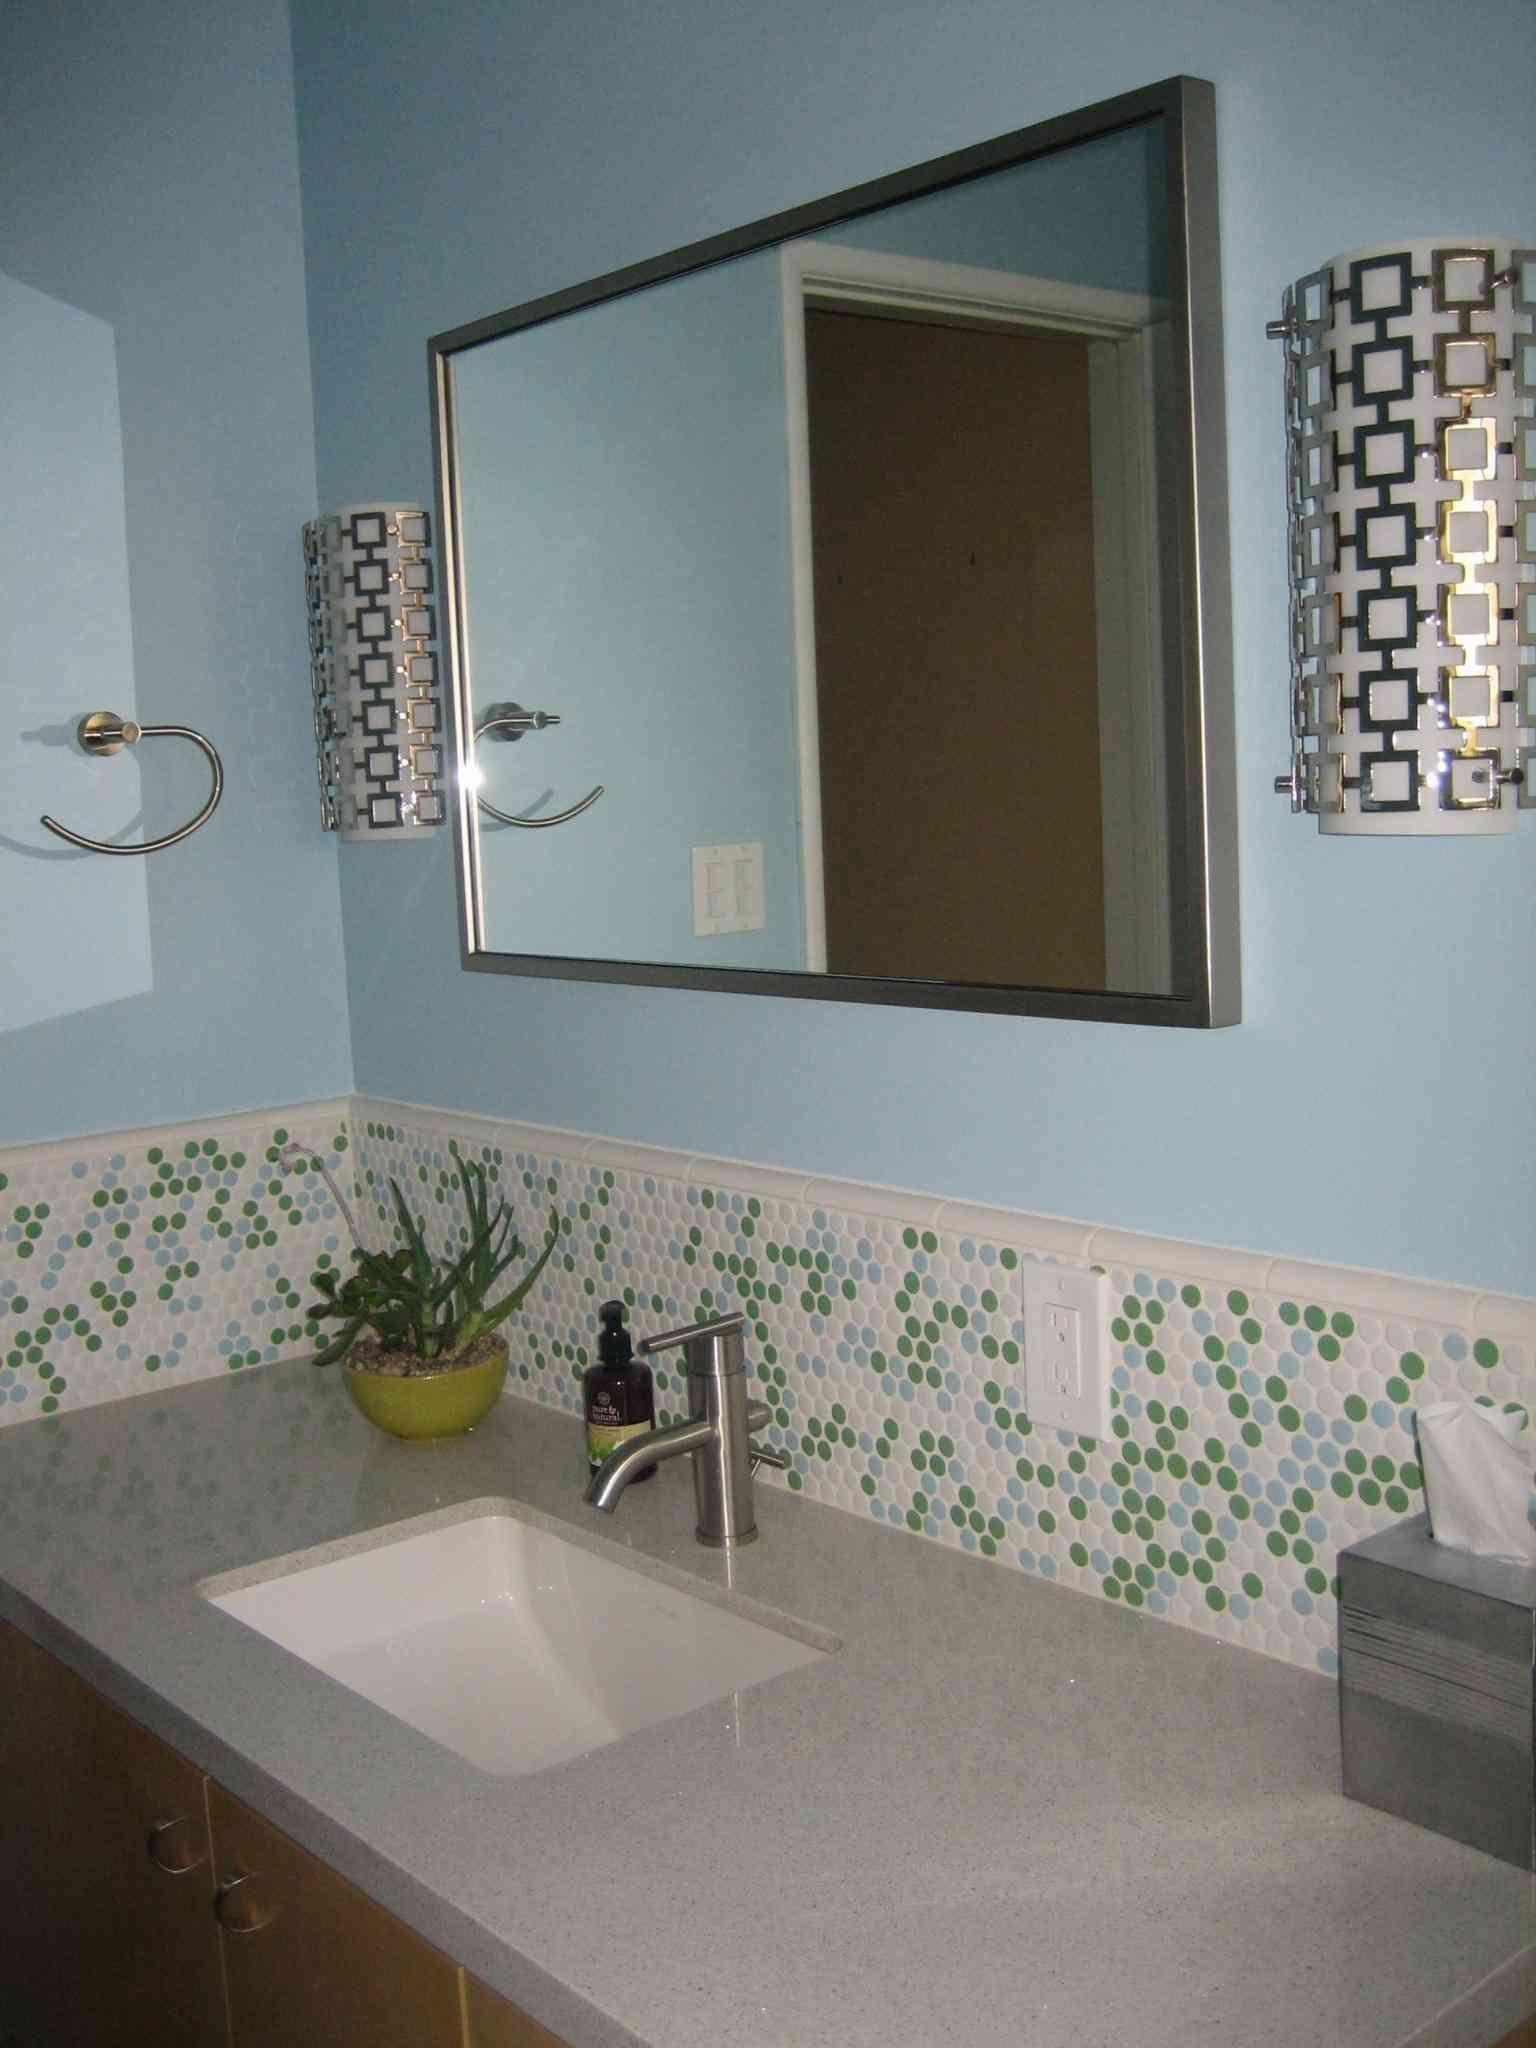 New Post sea glass mosaic tile bathroom | Bathroom_Ideas | Pinterest ...